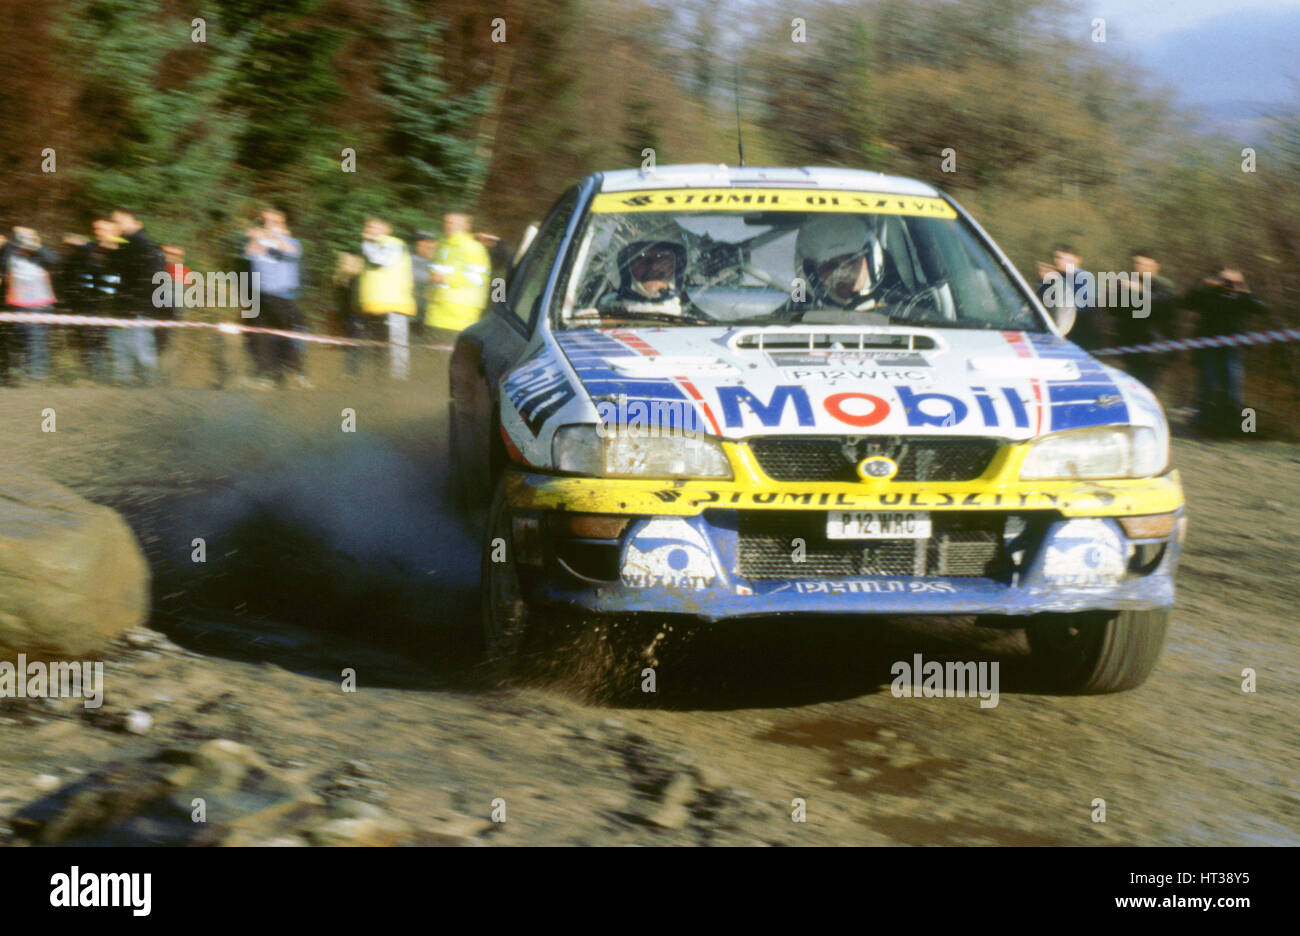 Subaru Impreza WRC 1998 network Q rally. Artista: Desconocido. Imagen De Stock